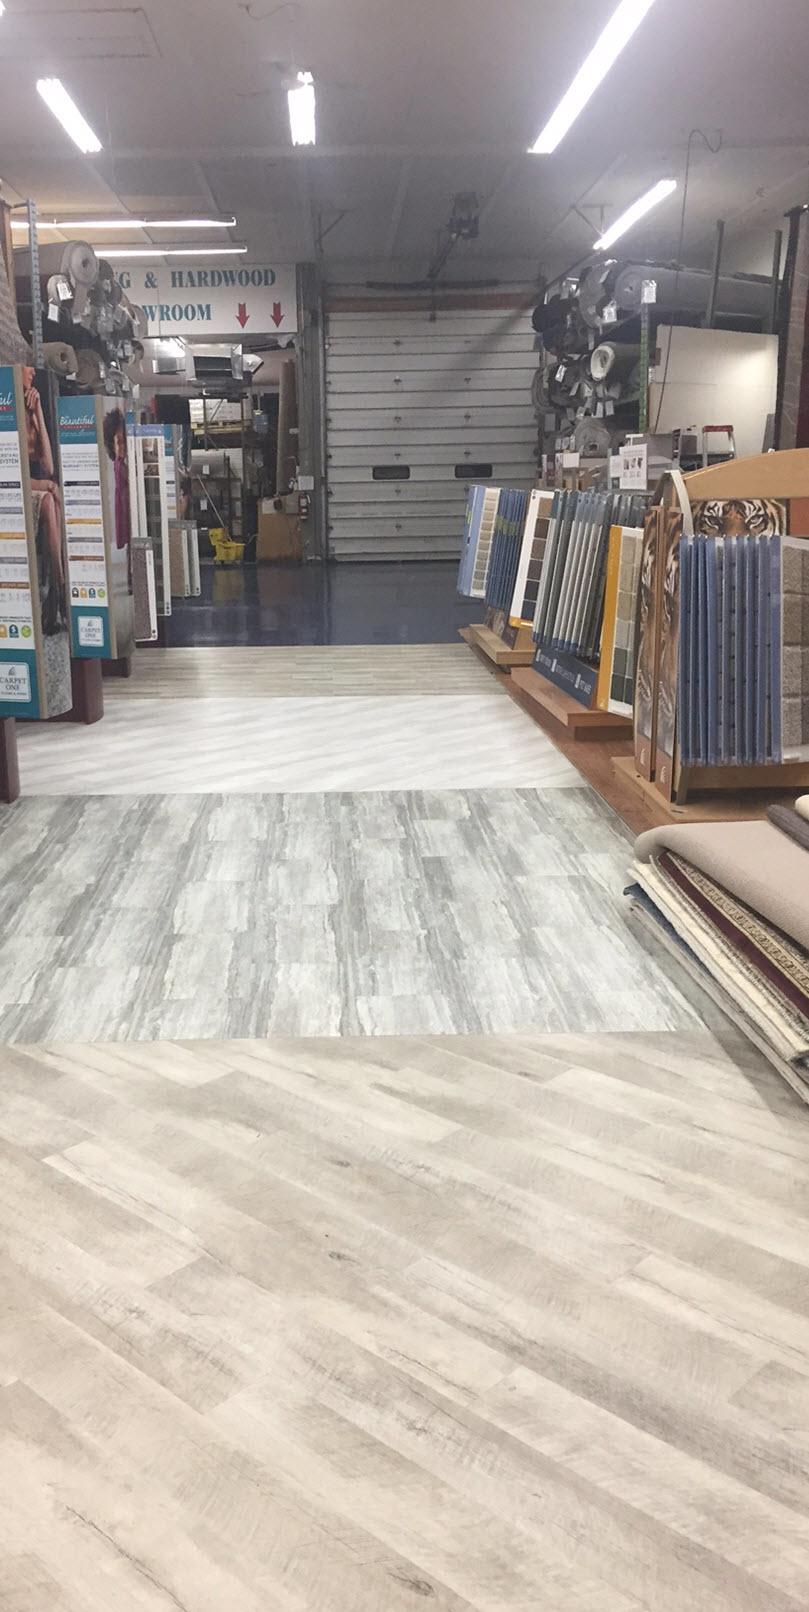 Dickson Carpet One Floor & Home